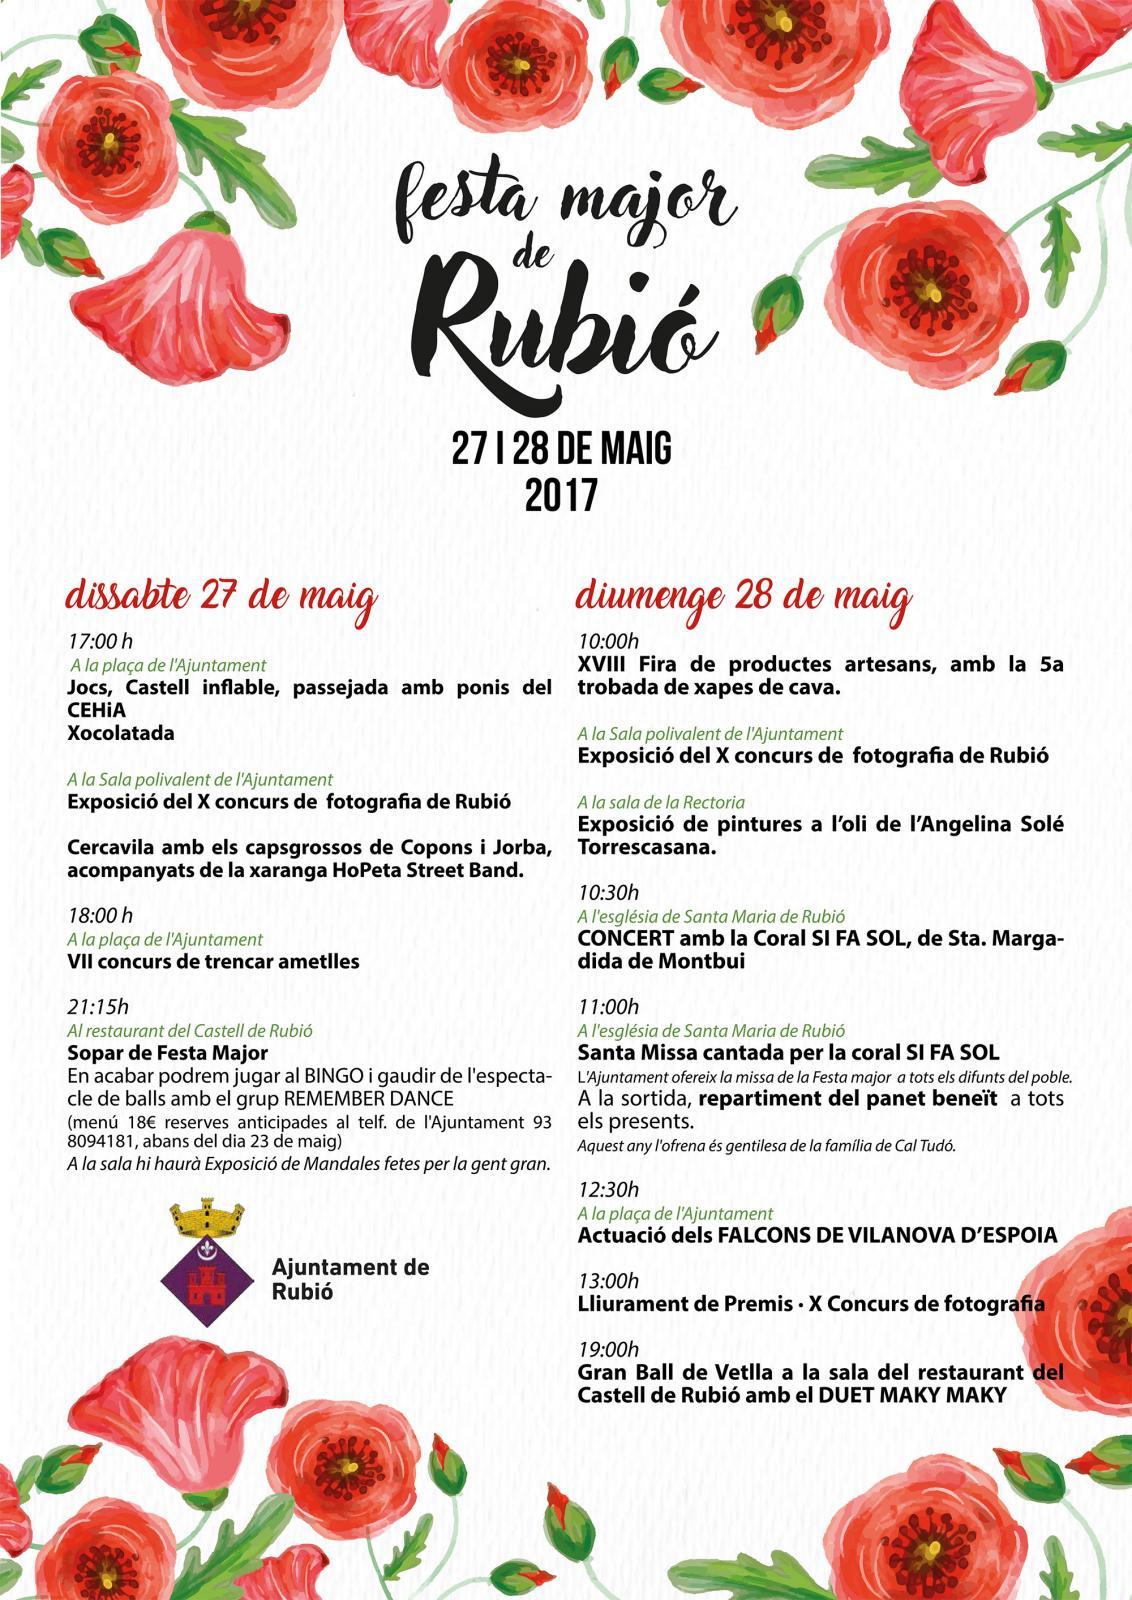 cartell Festa Major Rubió 2017